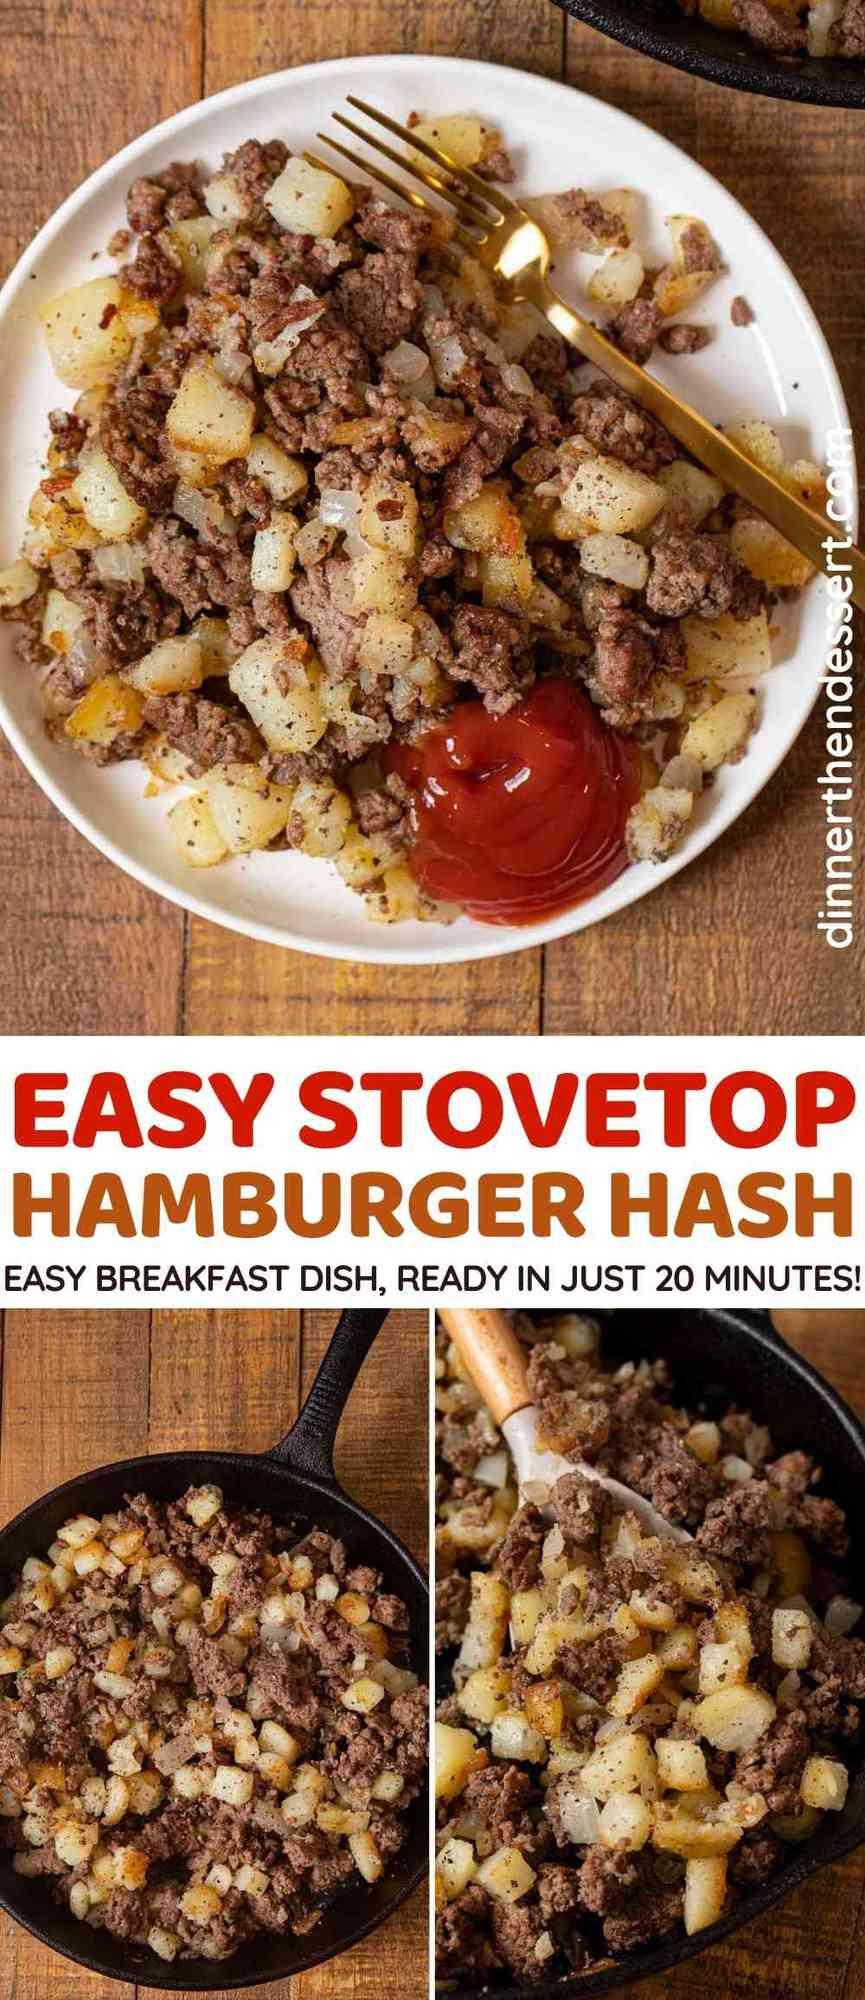 Hamburger Hash collage